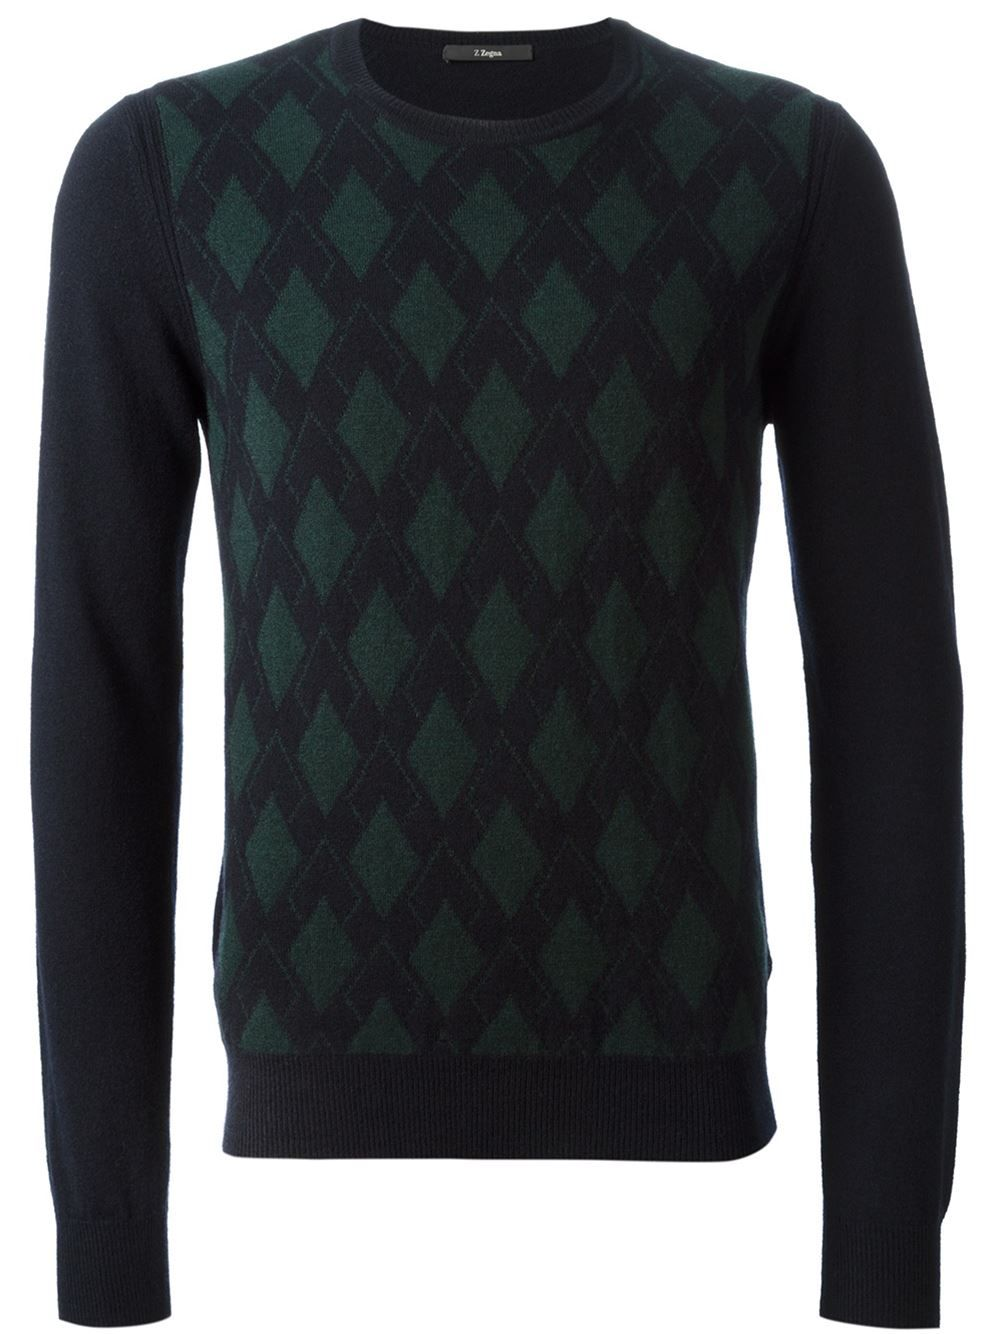 e114bc8c7b8359 Ermenegildo Zegna Argyle Pattern Sweater - Papini - Farfetch.com